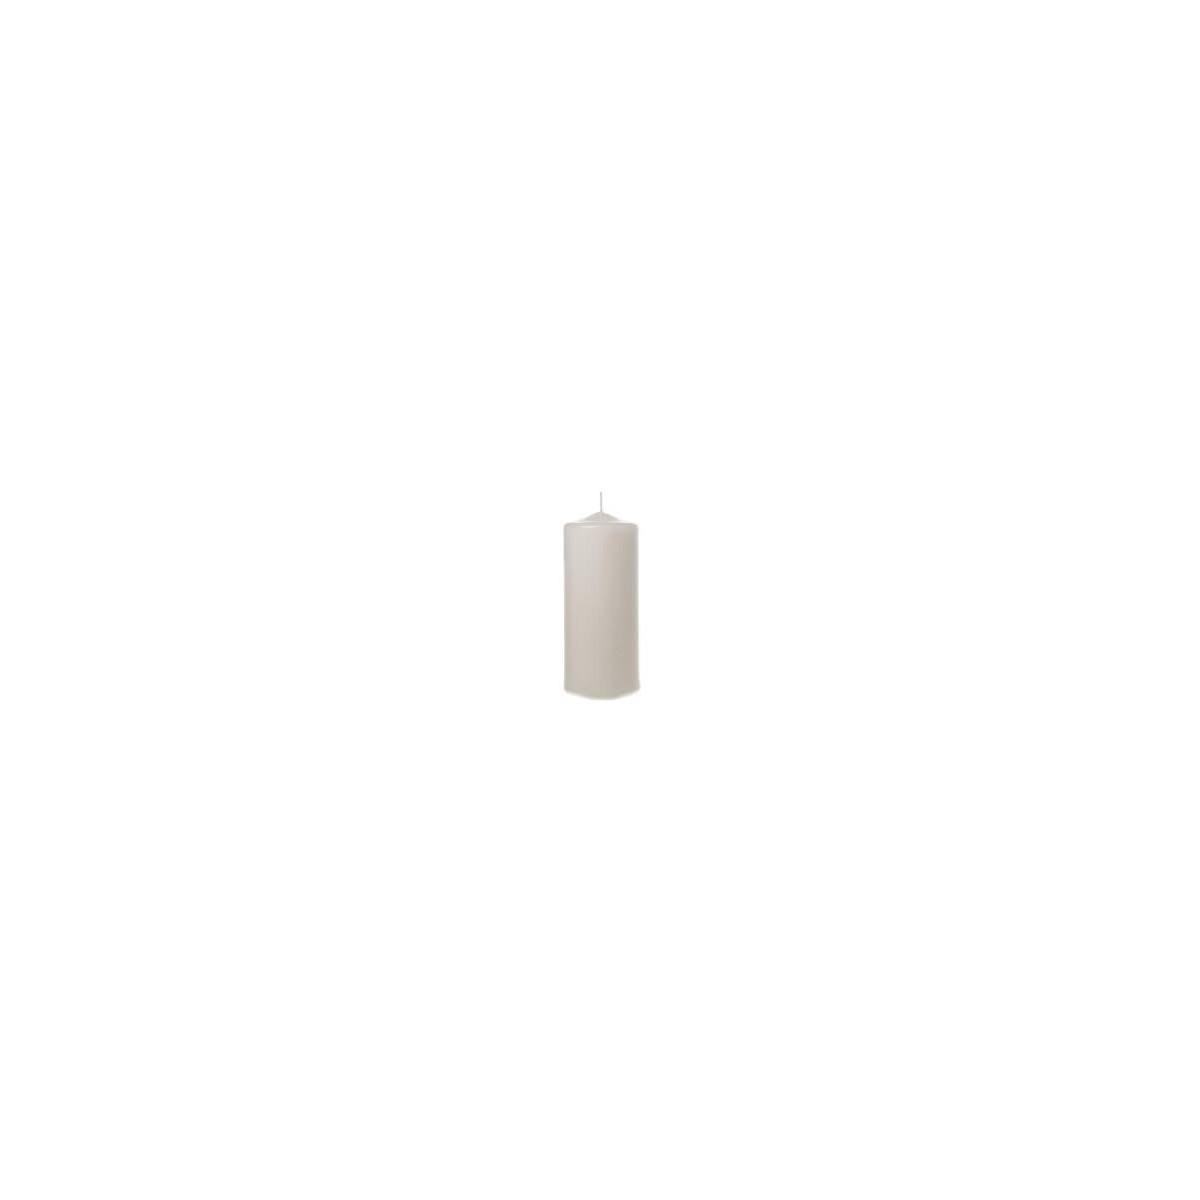 4 Moccoli Laccati mm 200 x dm 60 Bianco